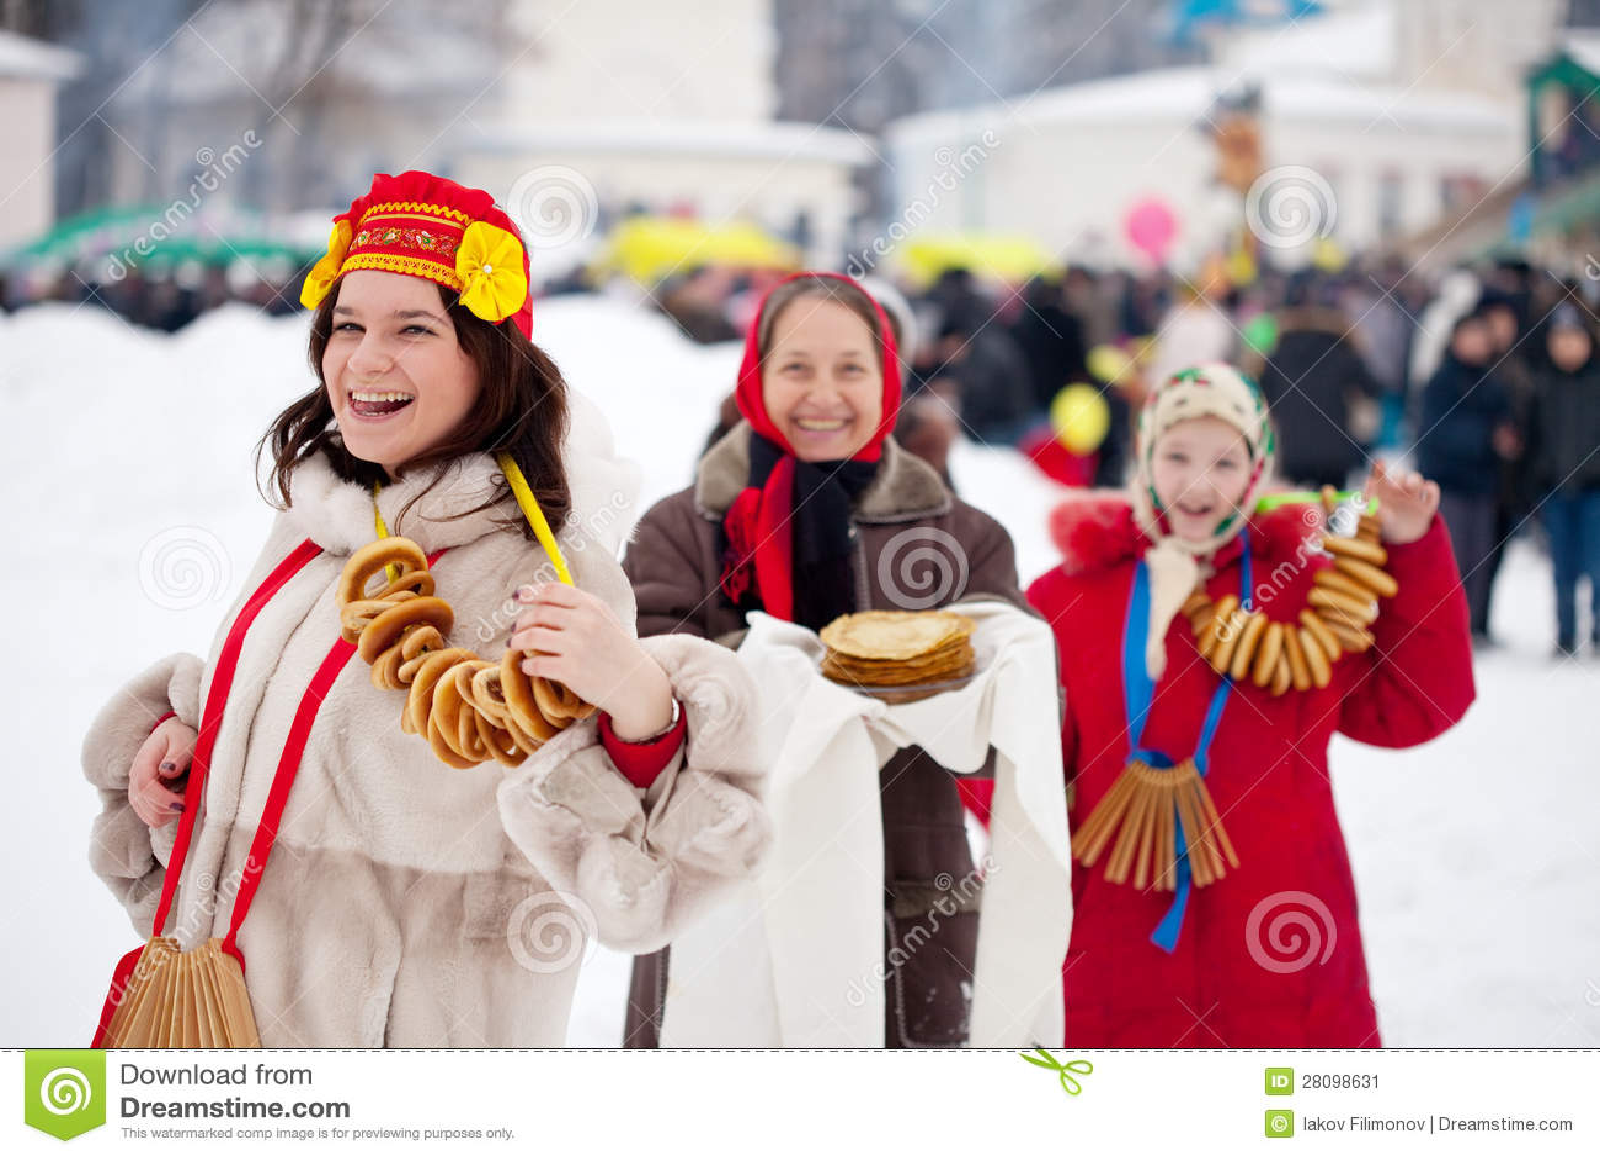 Mujeres durante el festival de Maslenitsa en Rusia